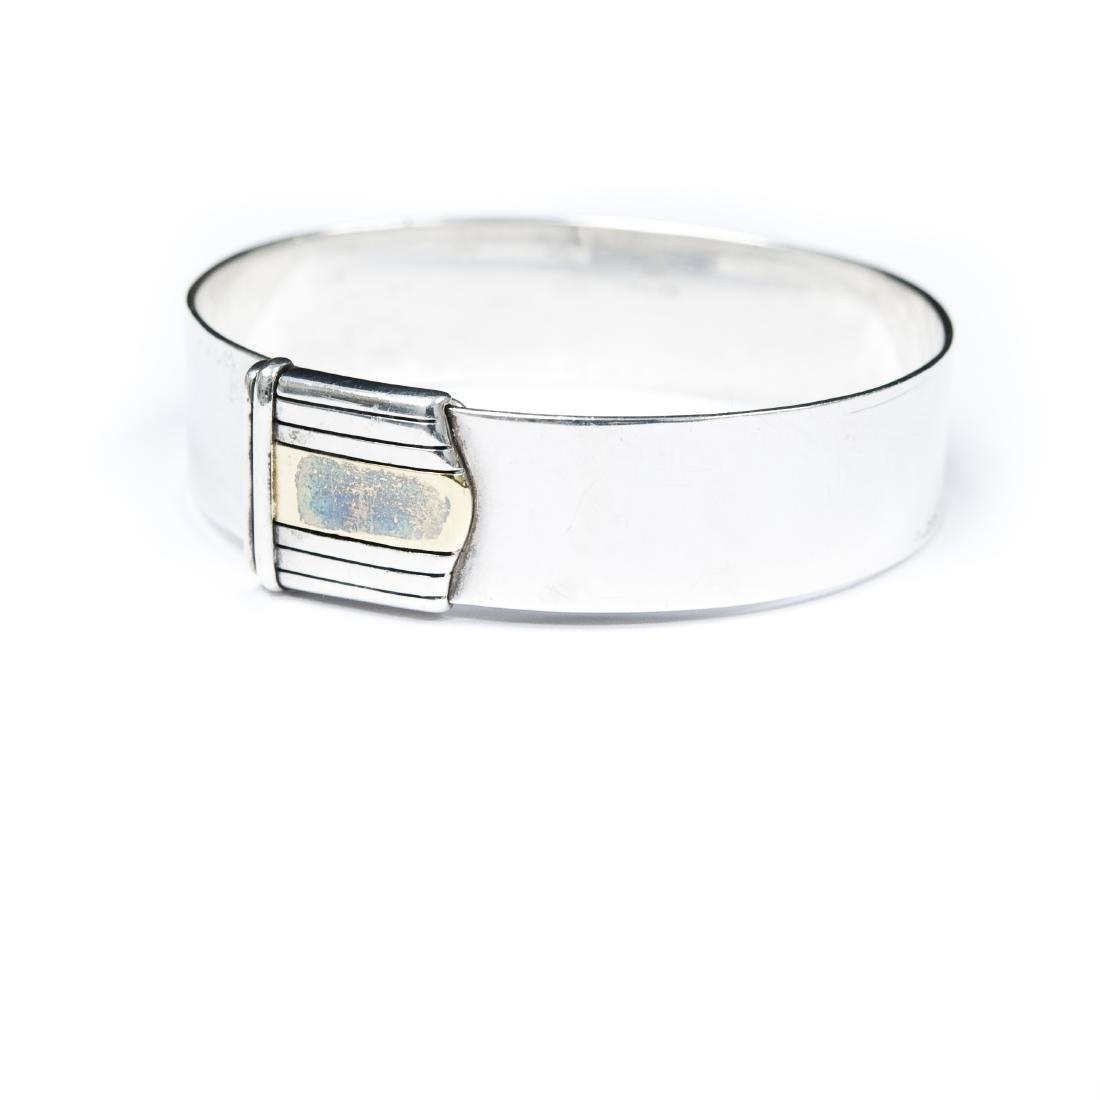 Cartier Sterling Silver & Gold Cuff Bracelet.